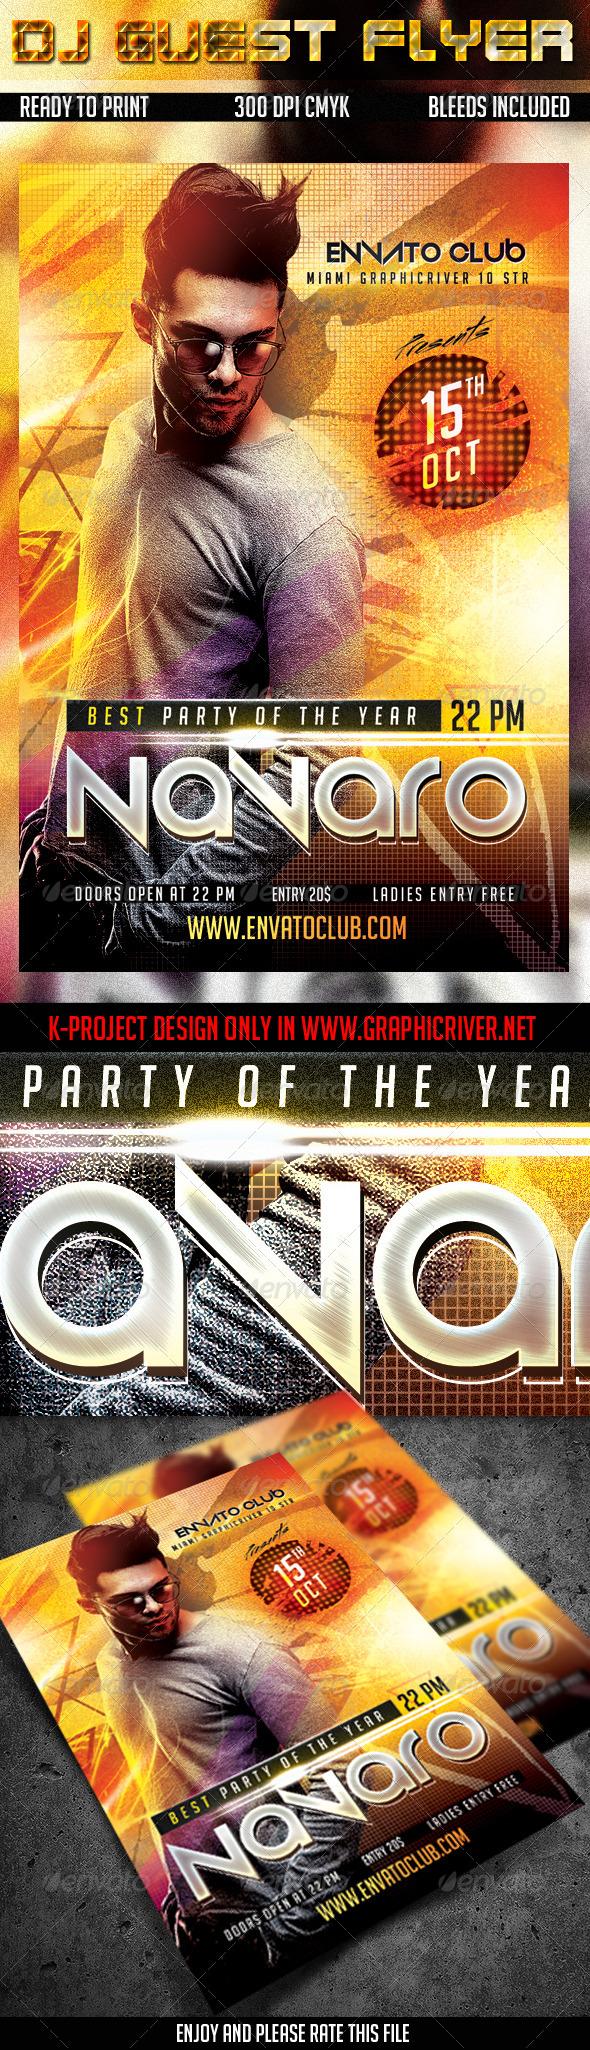 GraphicRiver DJ Guest Flyer 8588049